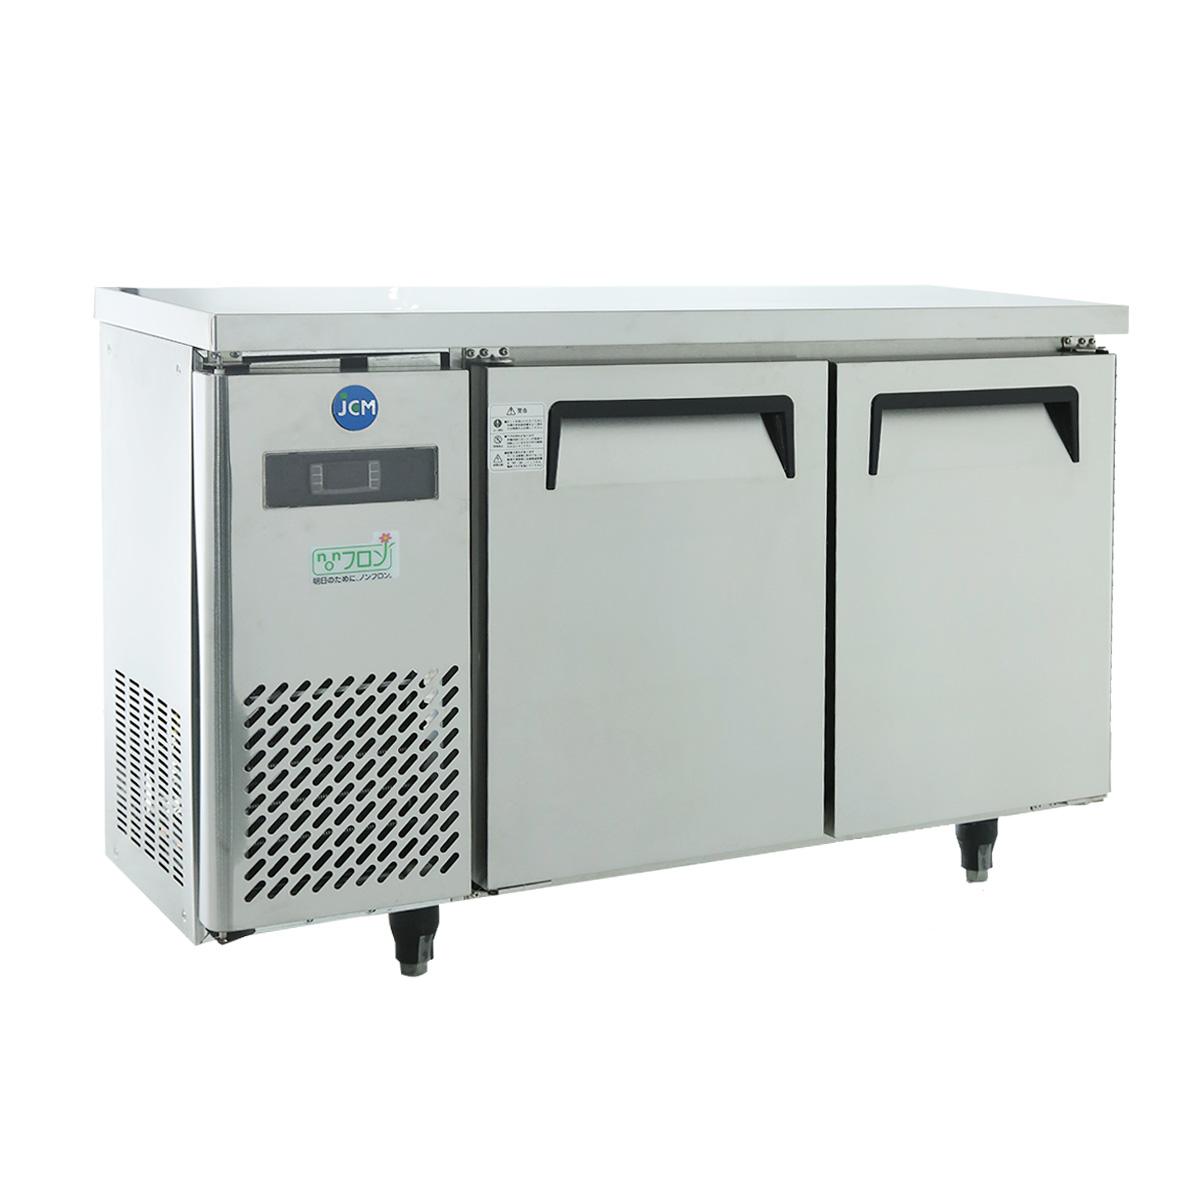 JCM ヨコ型 冷蔵庫 JCMR-1245T 業務用 冷蔵 コールドテーブル 台下 省エネ 【代引不可】